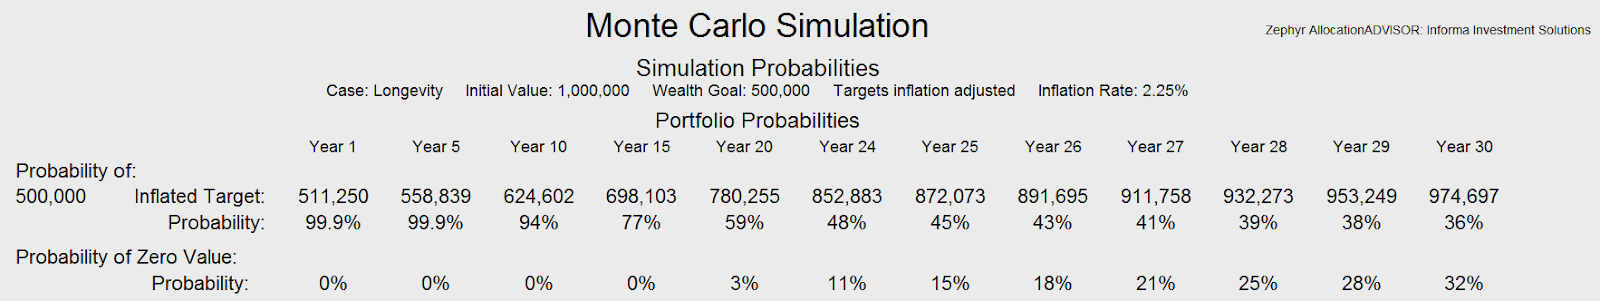 Figure 3: Monte Carlo simulation, wealth goal